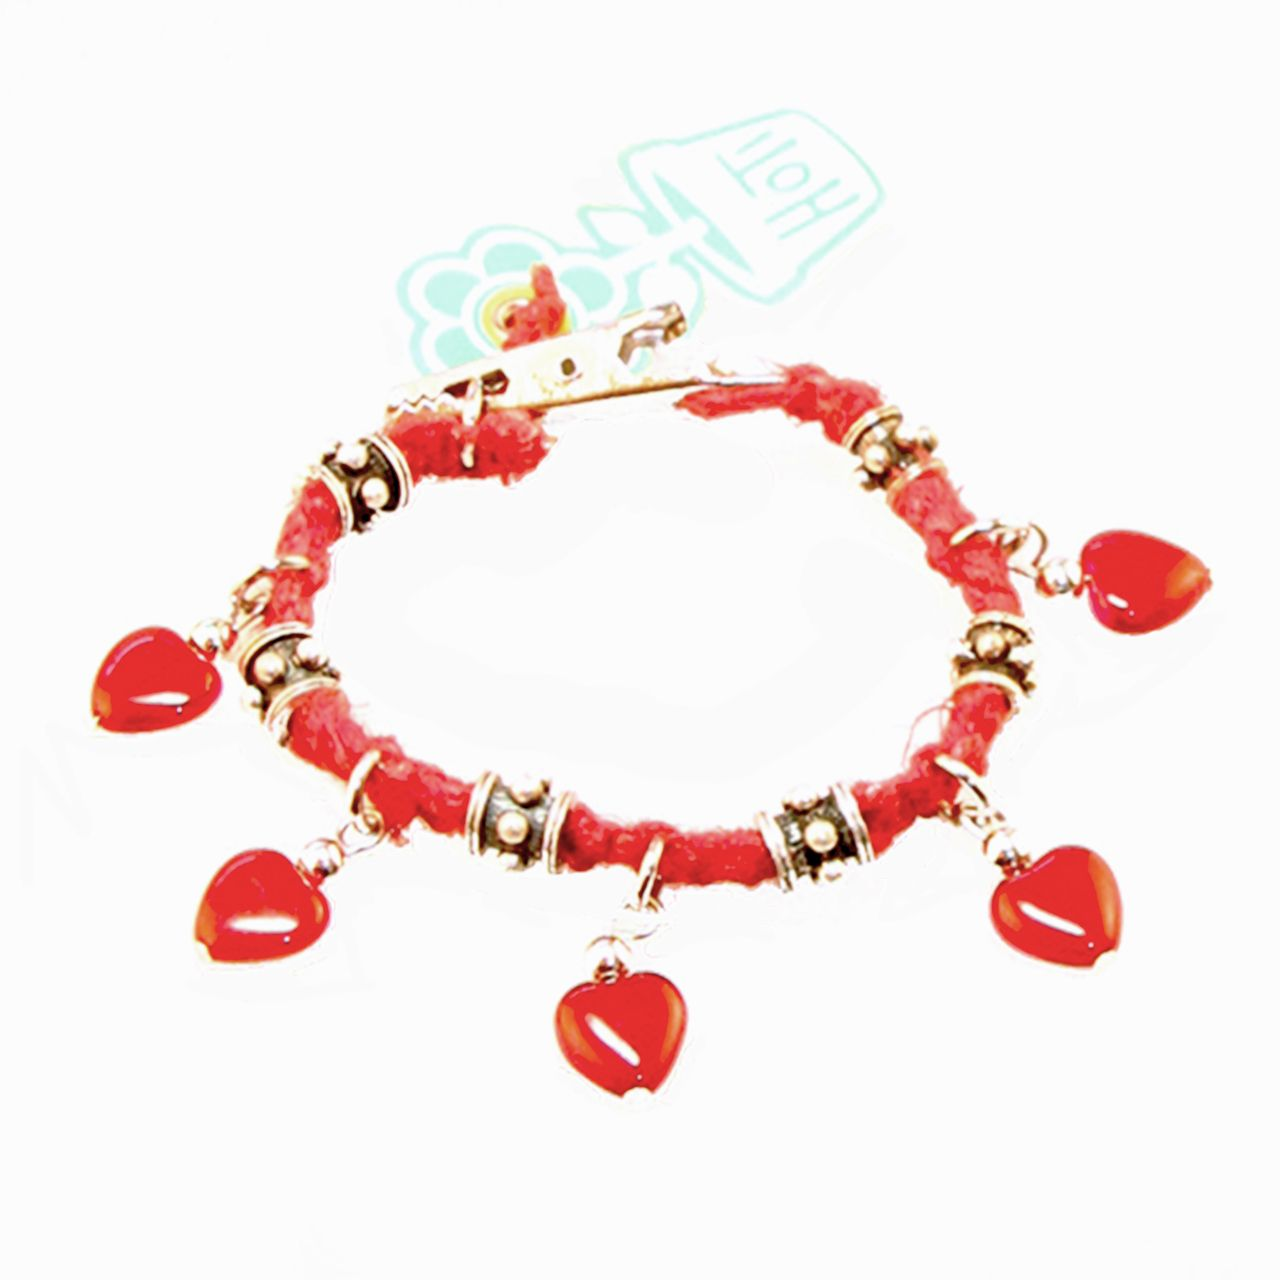 Sunshine On A Cloudy Day  Hoti Hemp I Heart Rock Red Handmade Glass Charm  Bracelet